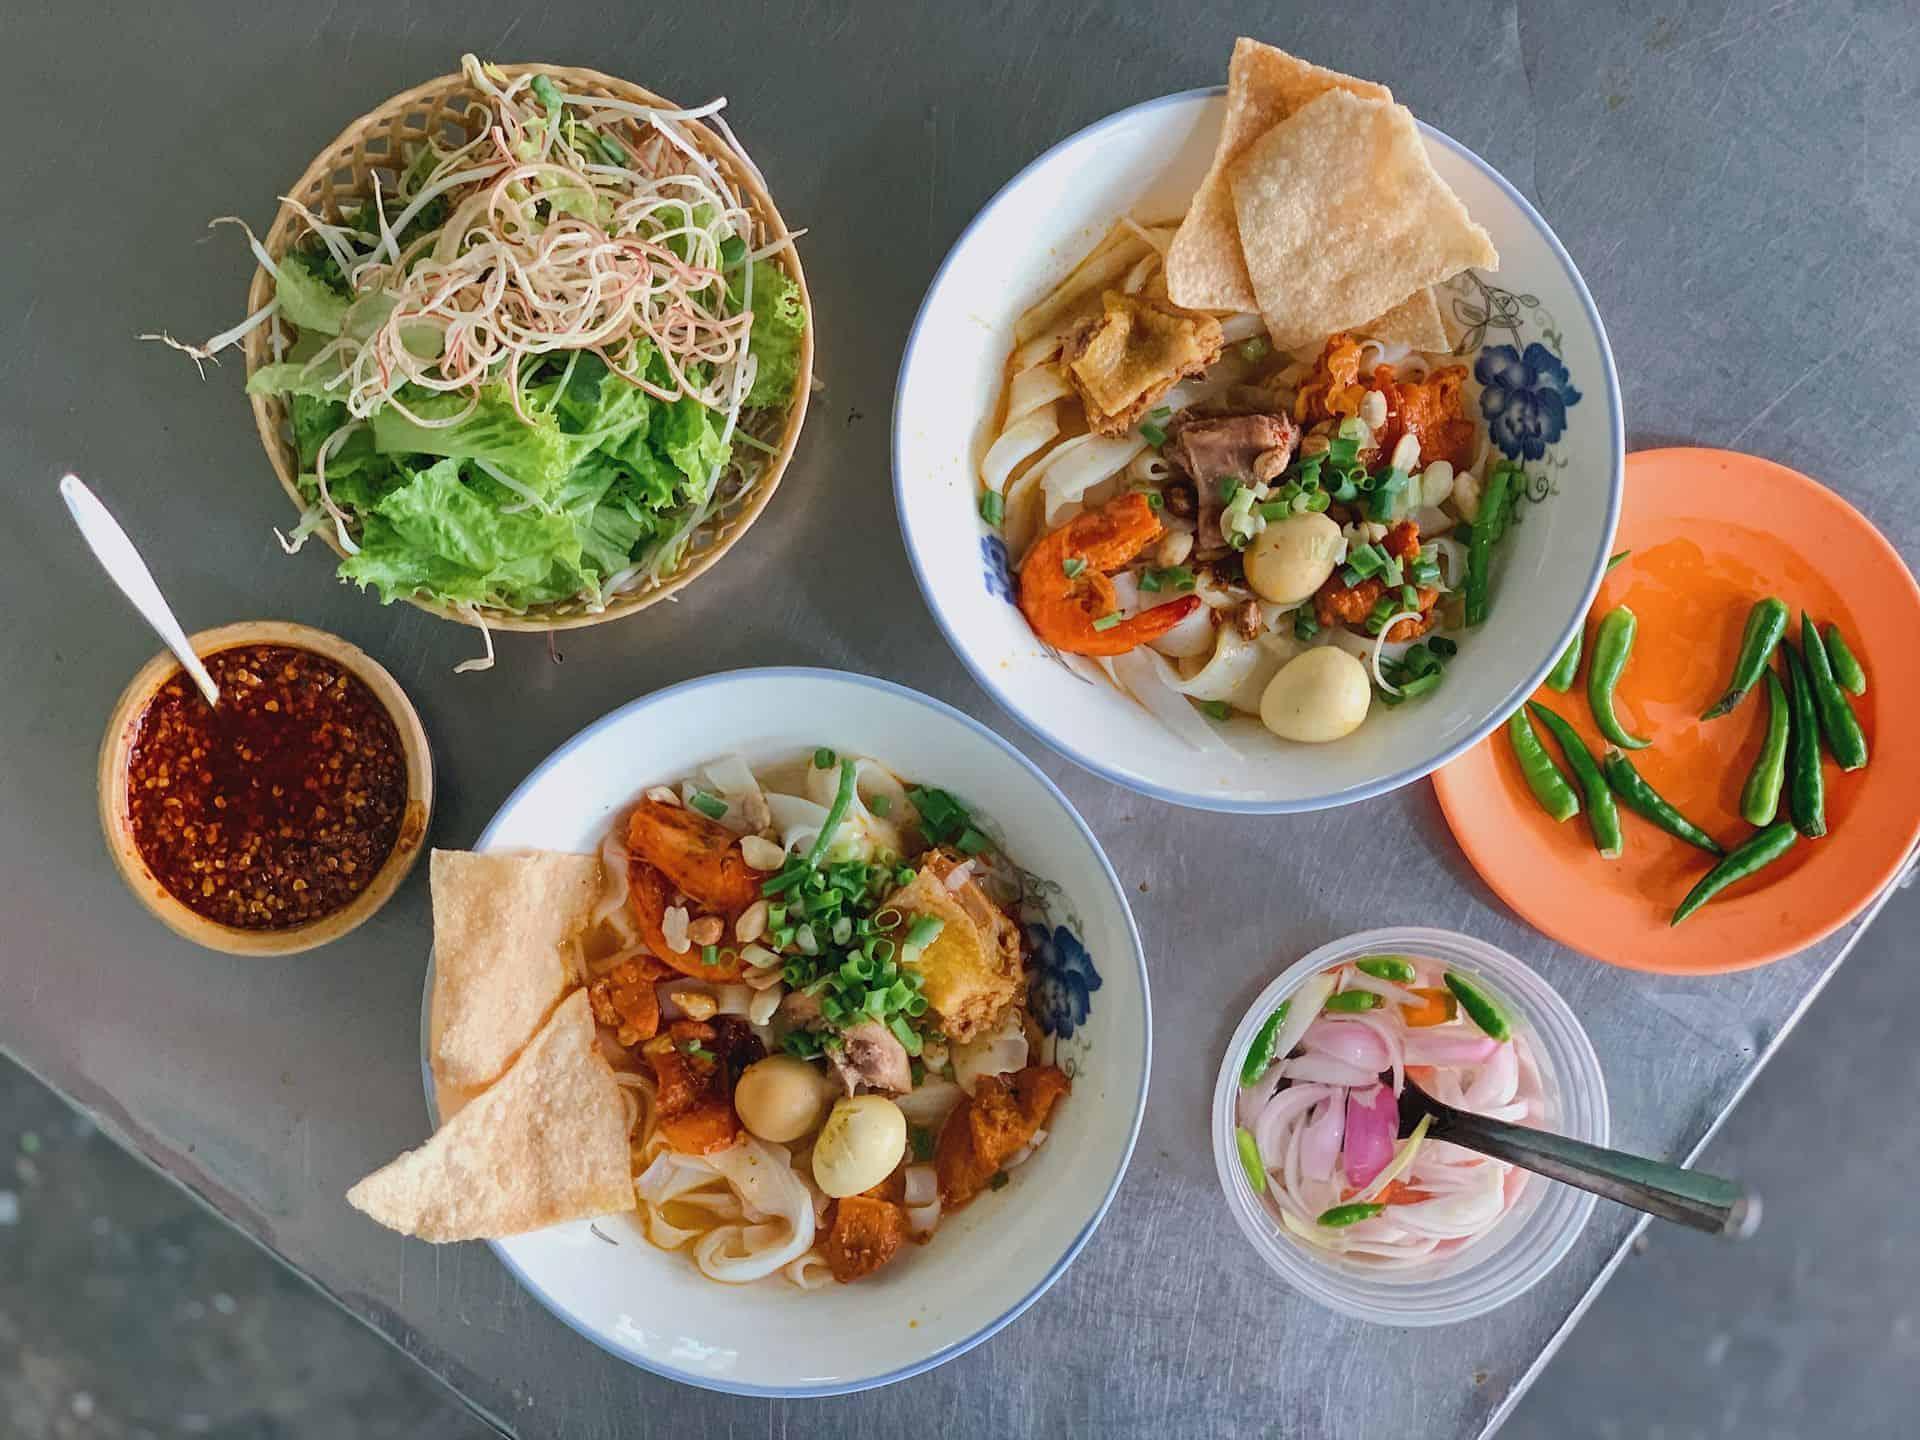 Phong Nam Ancient Village Quang Noodles